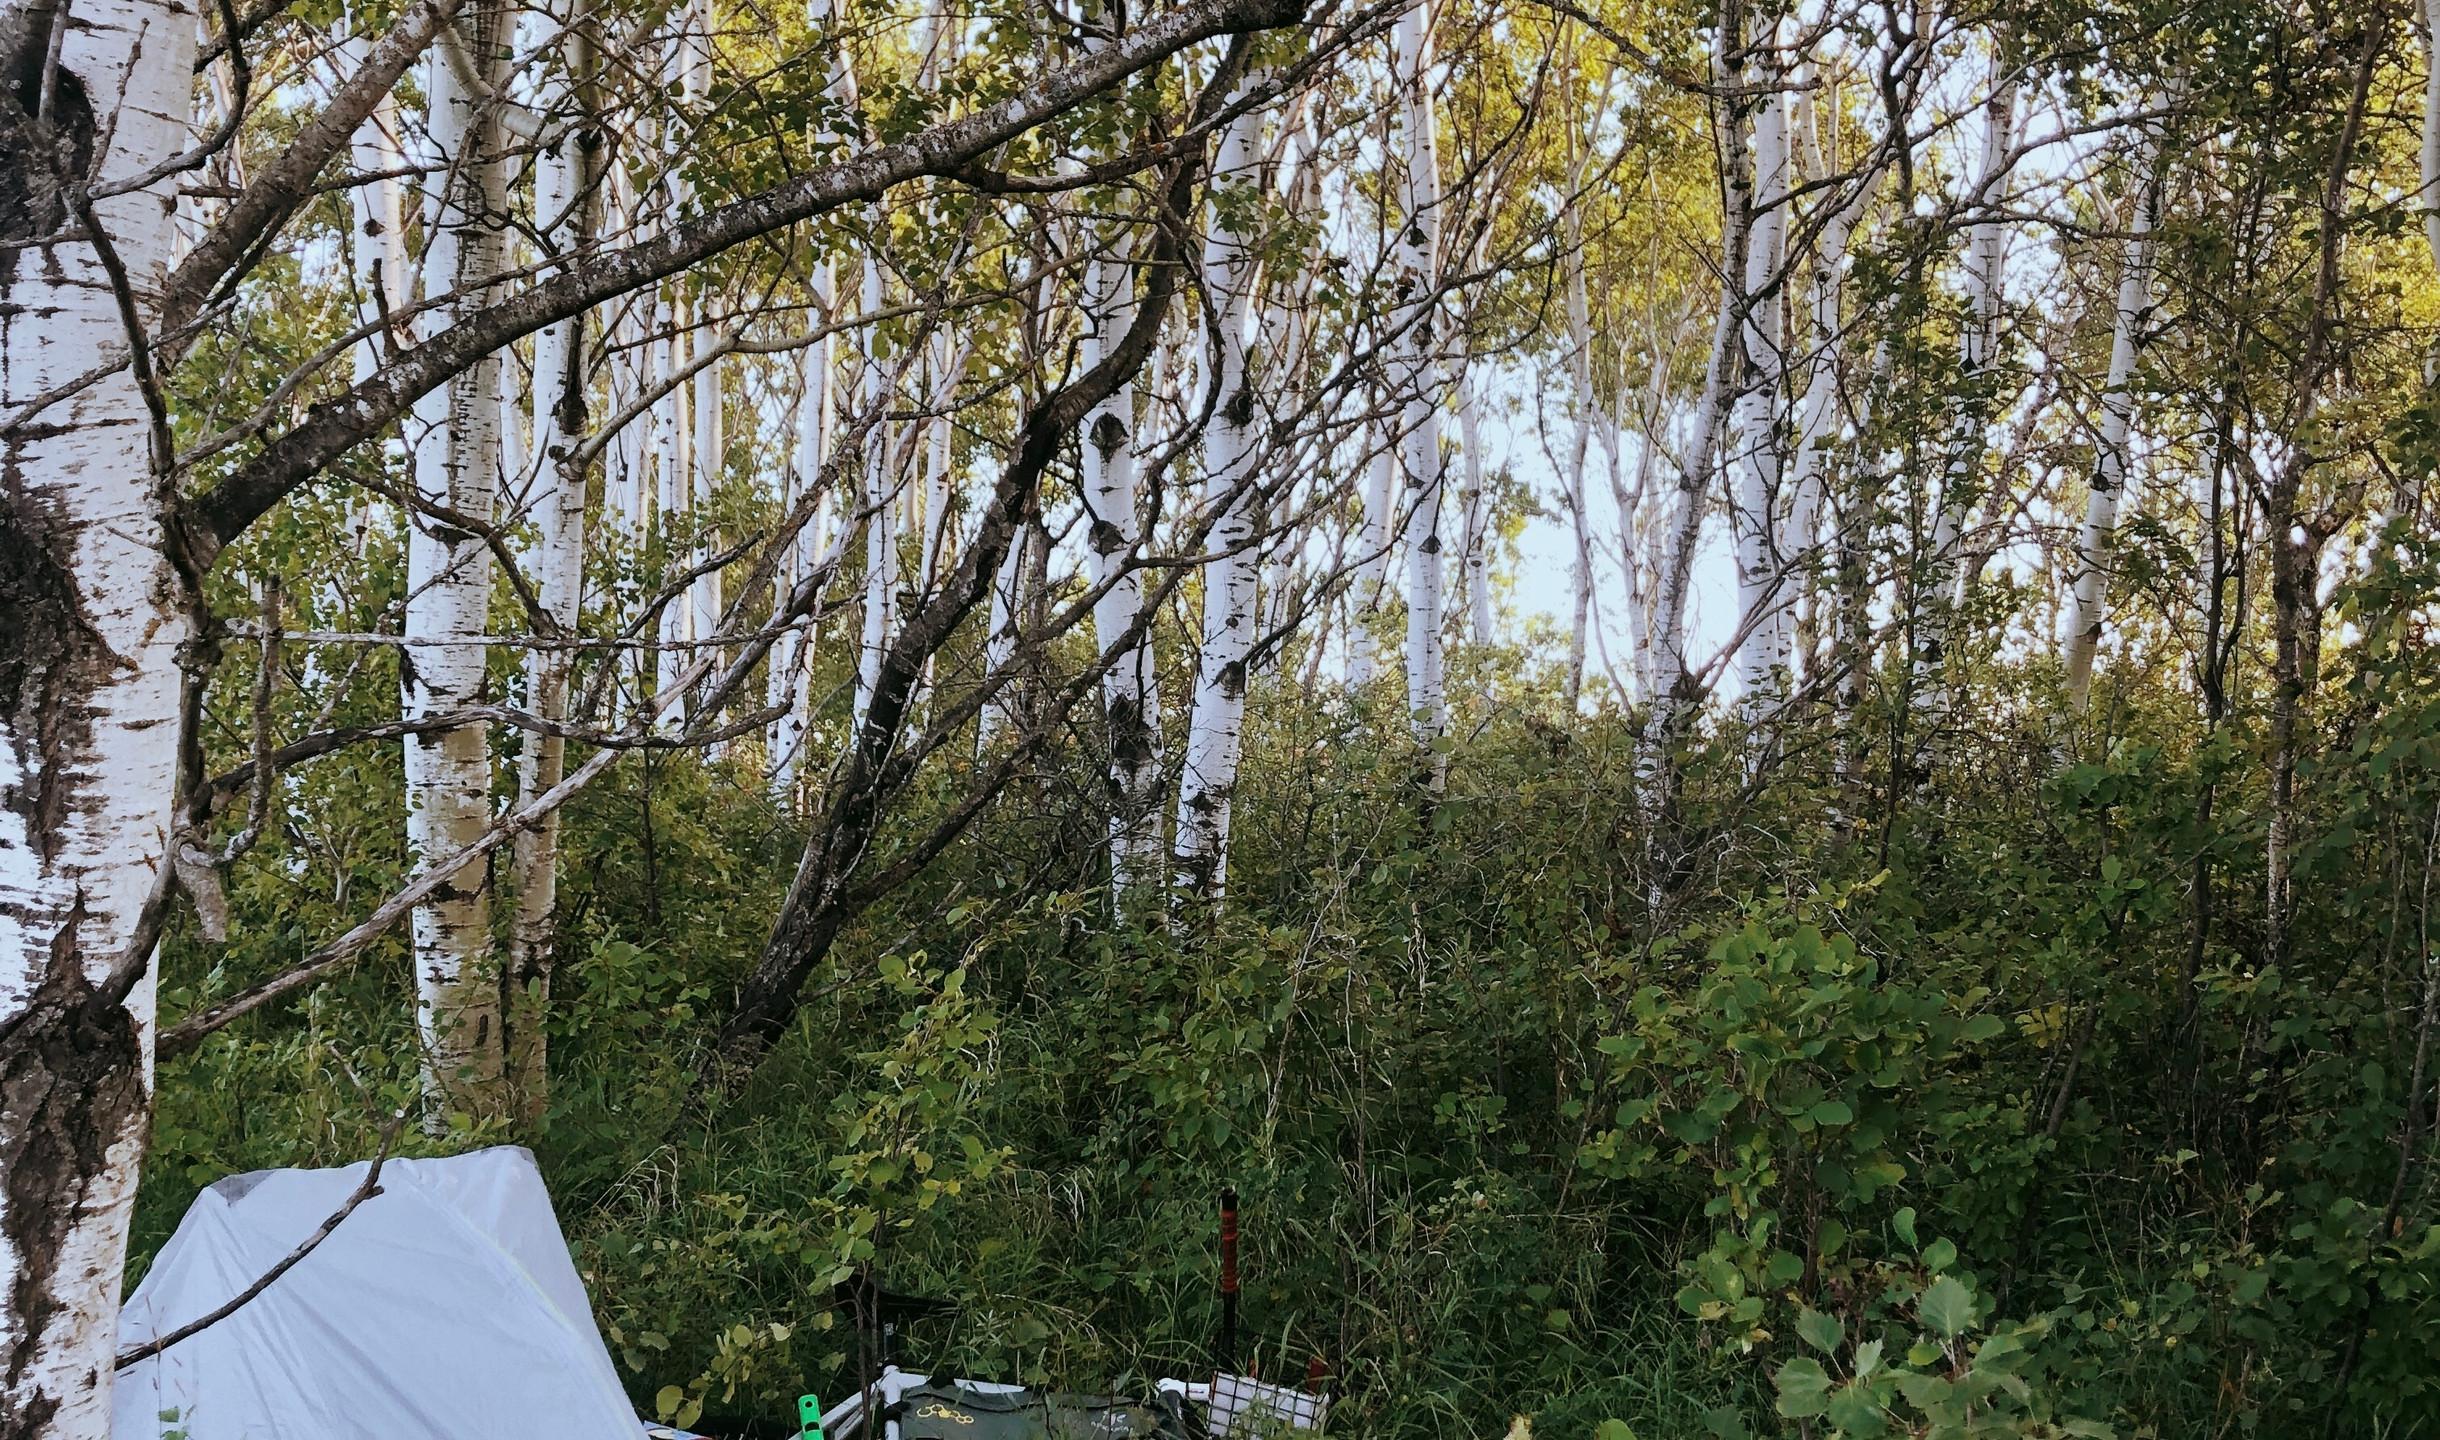 camping tent in aspen grove